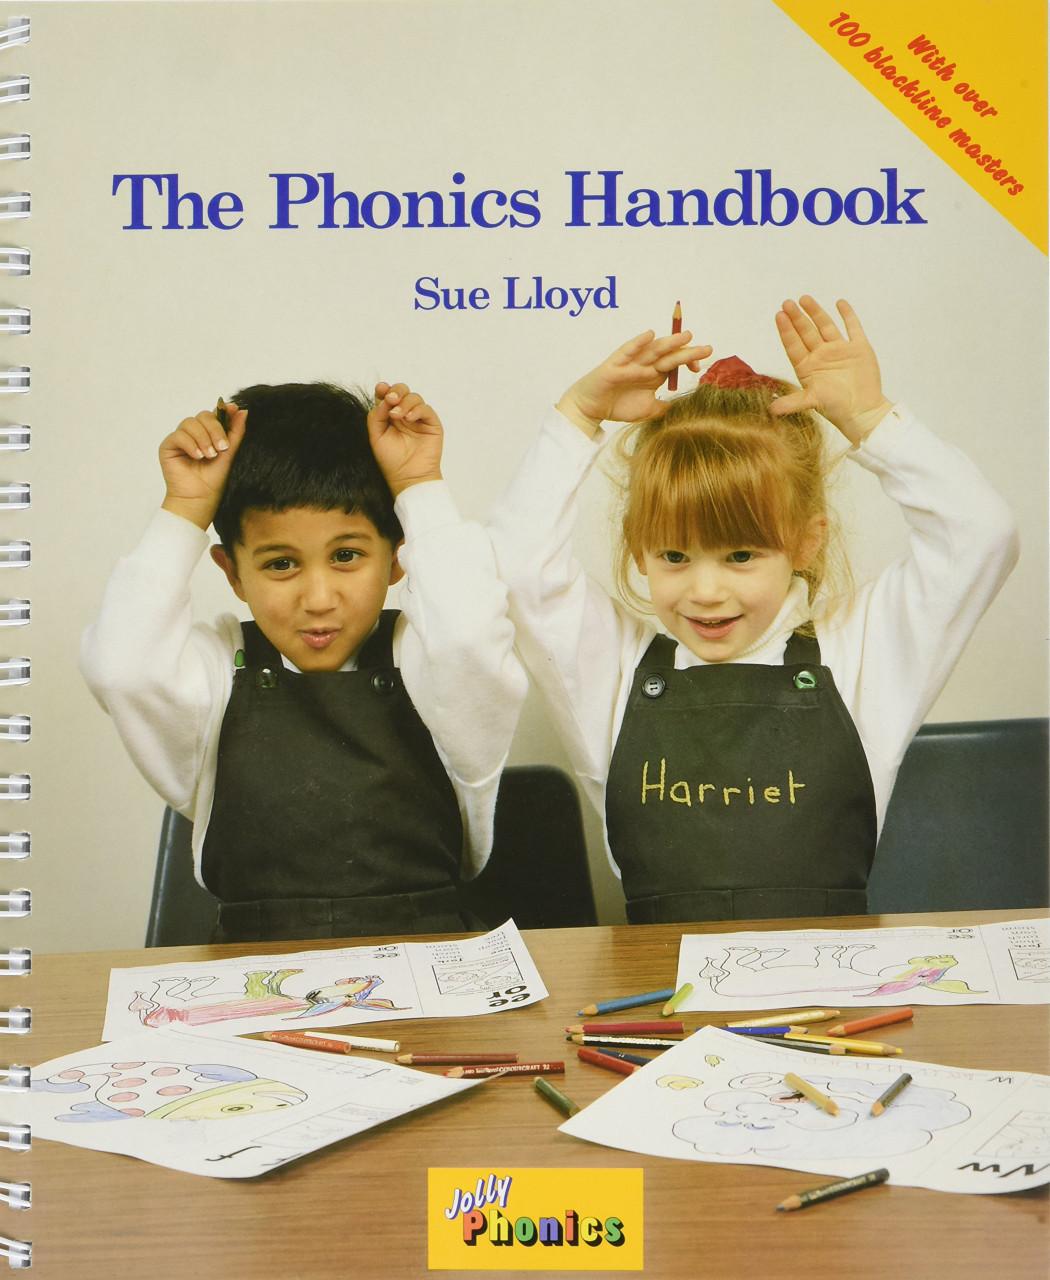 Phonics Handbook, the - with over 100 Photocopy Masters